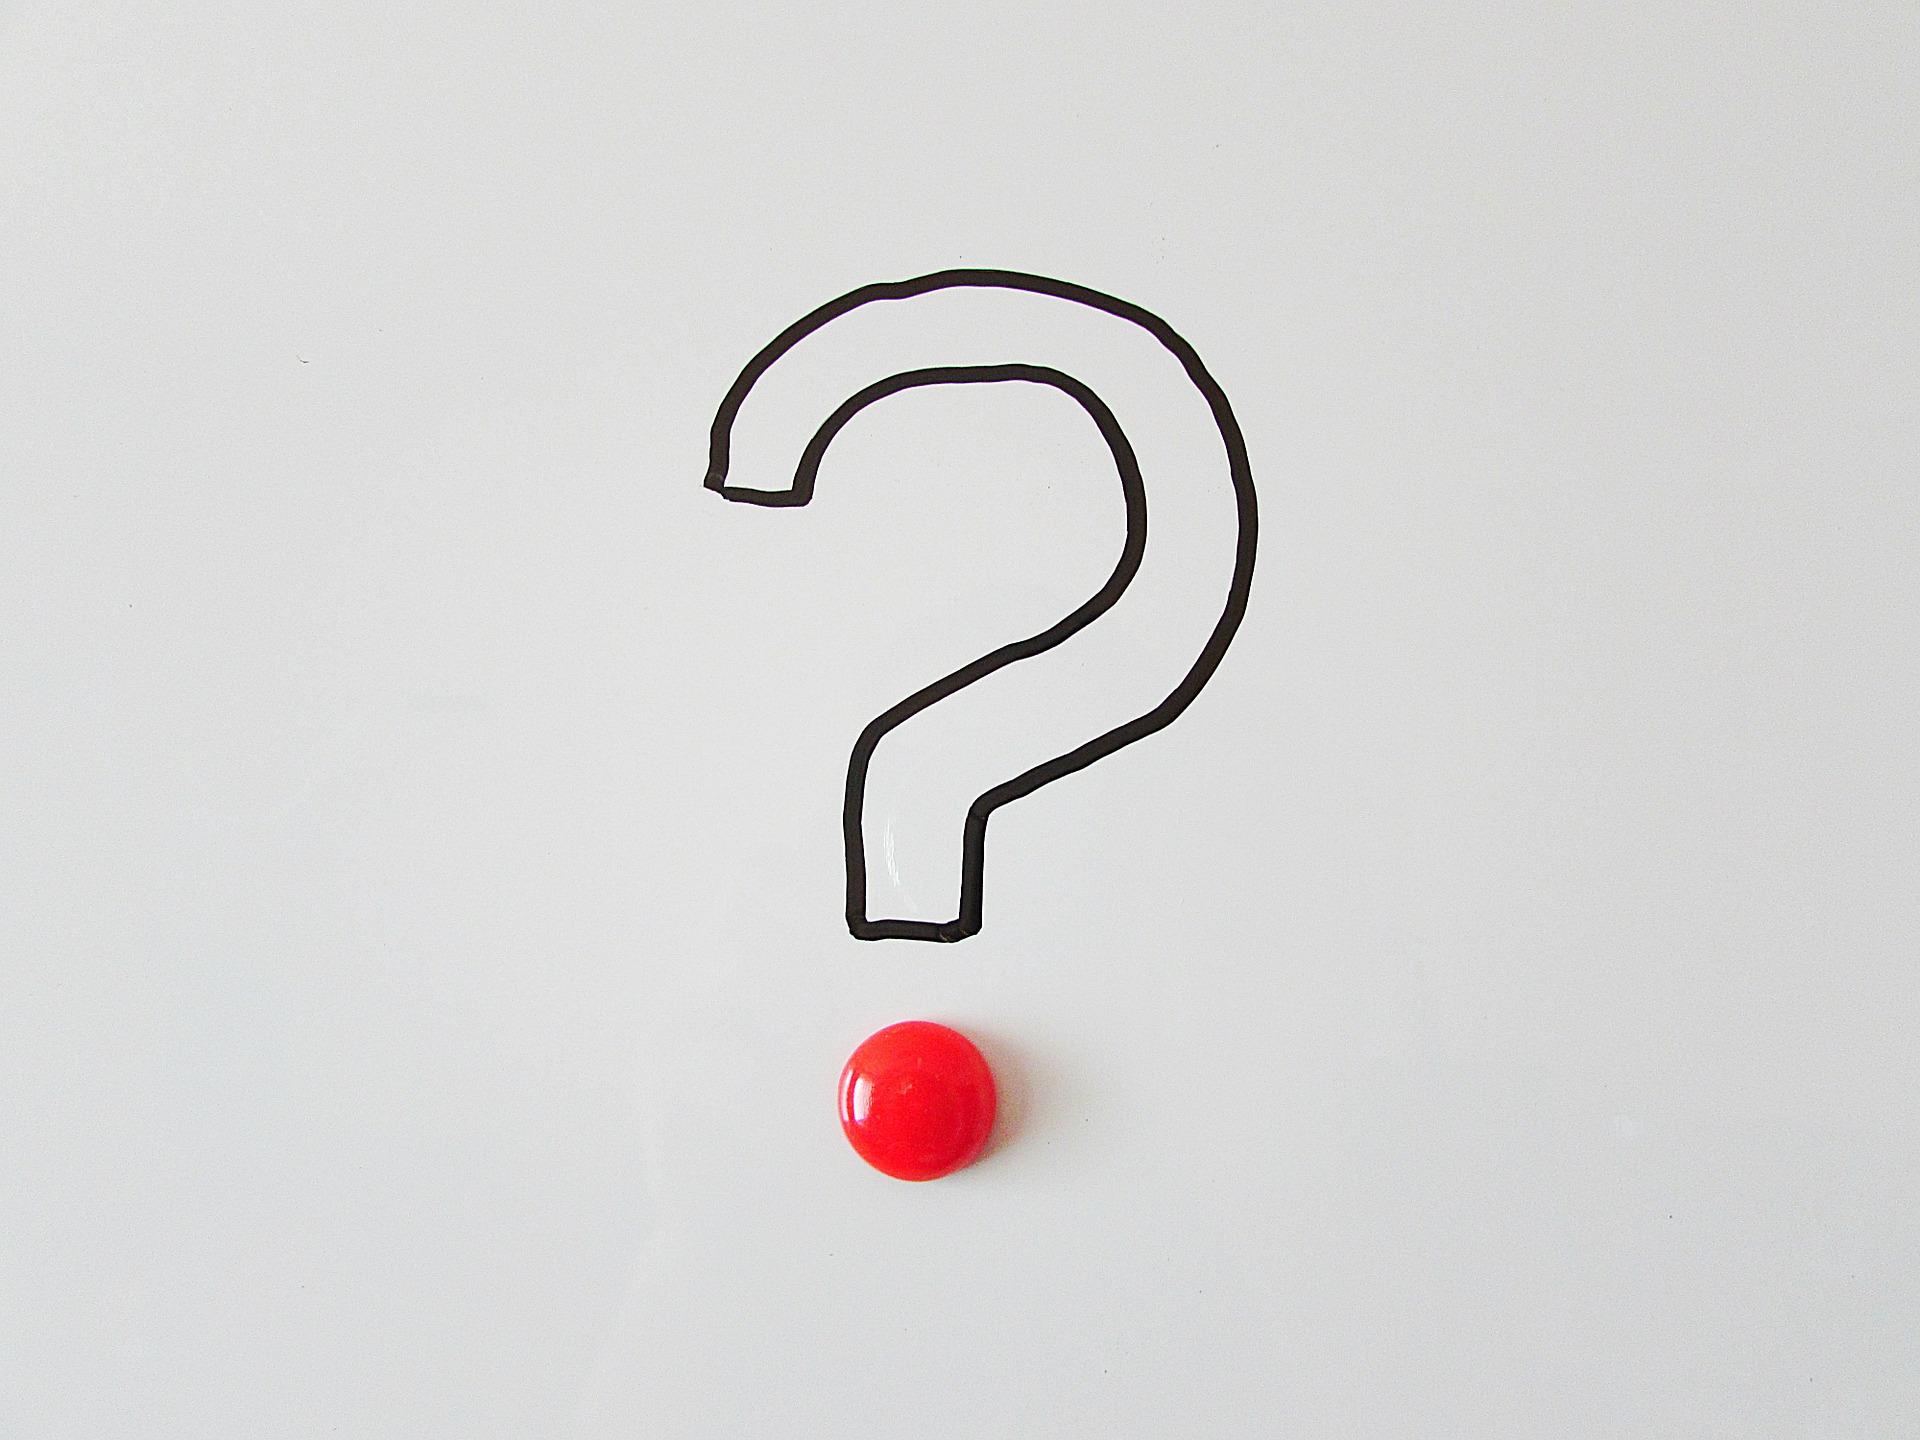 question-mark-faq-antworten-fragen-nwb immobilien